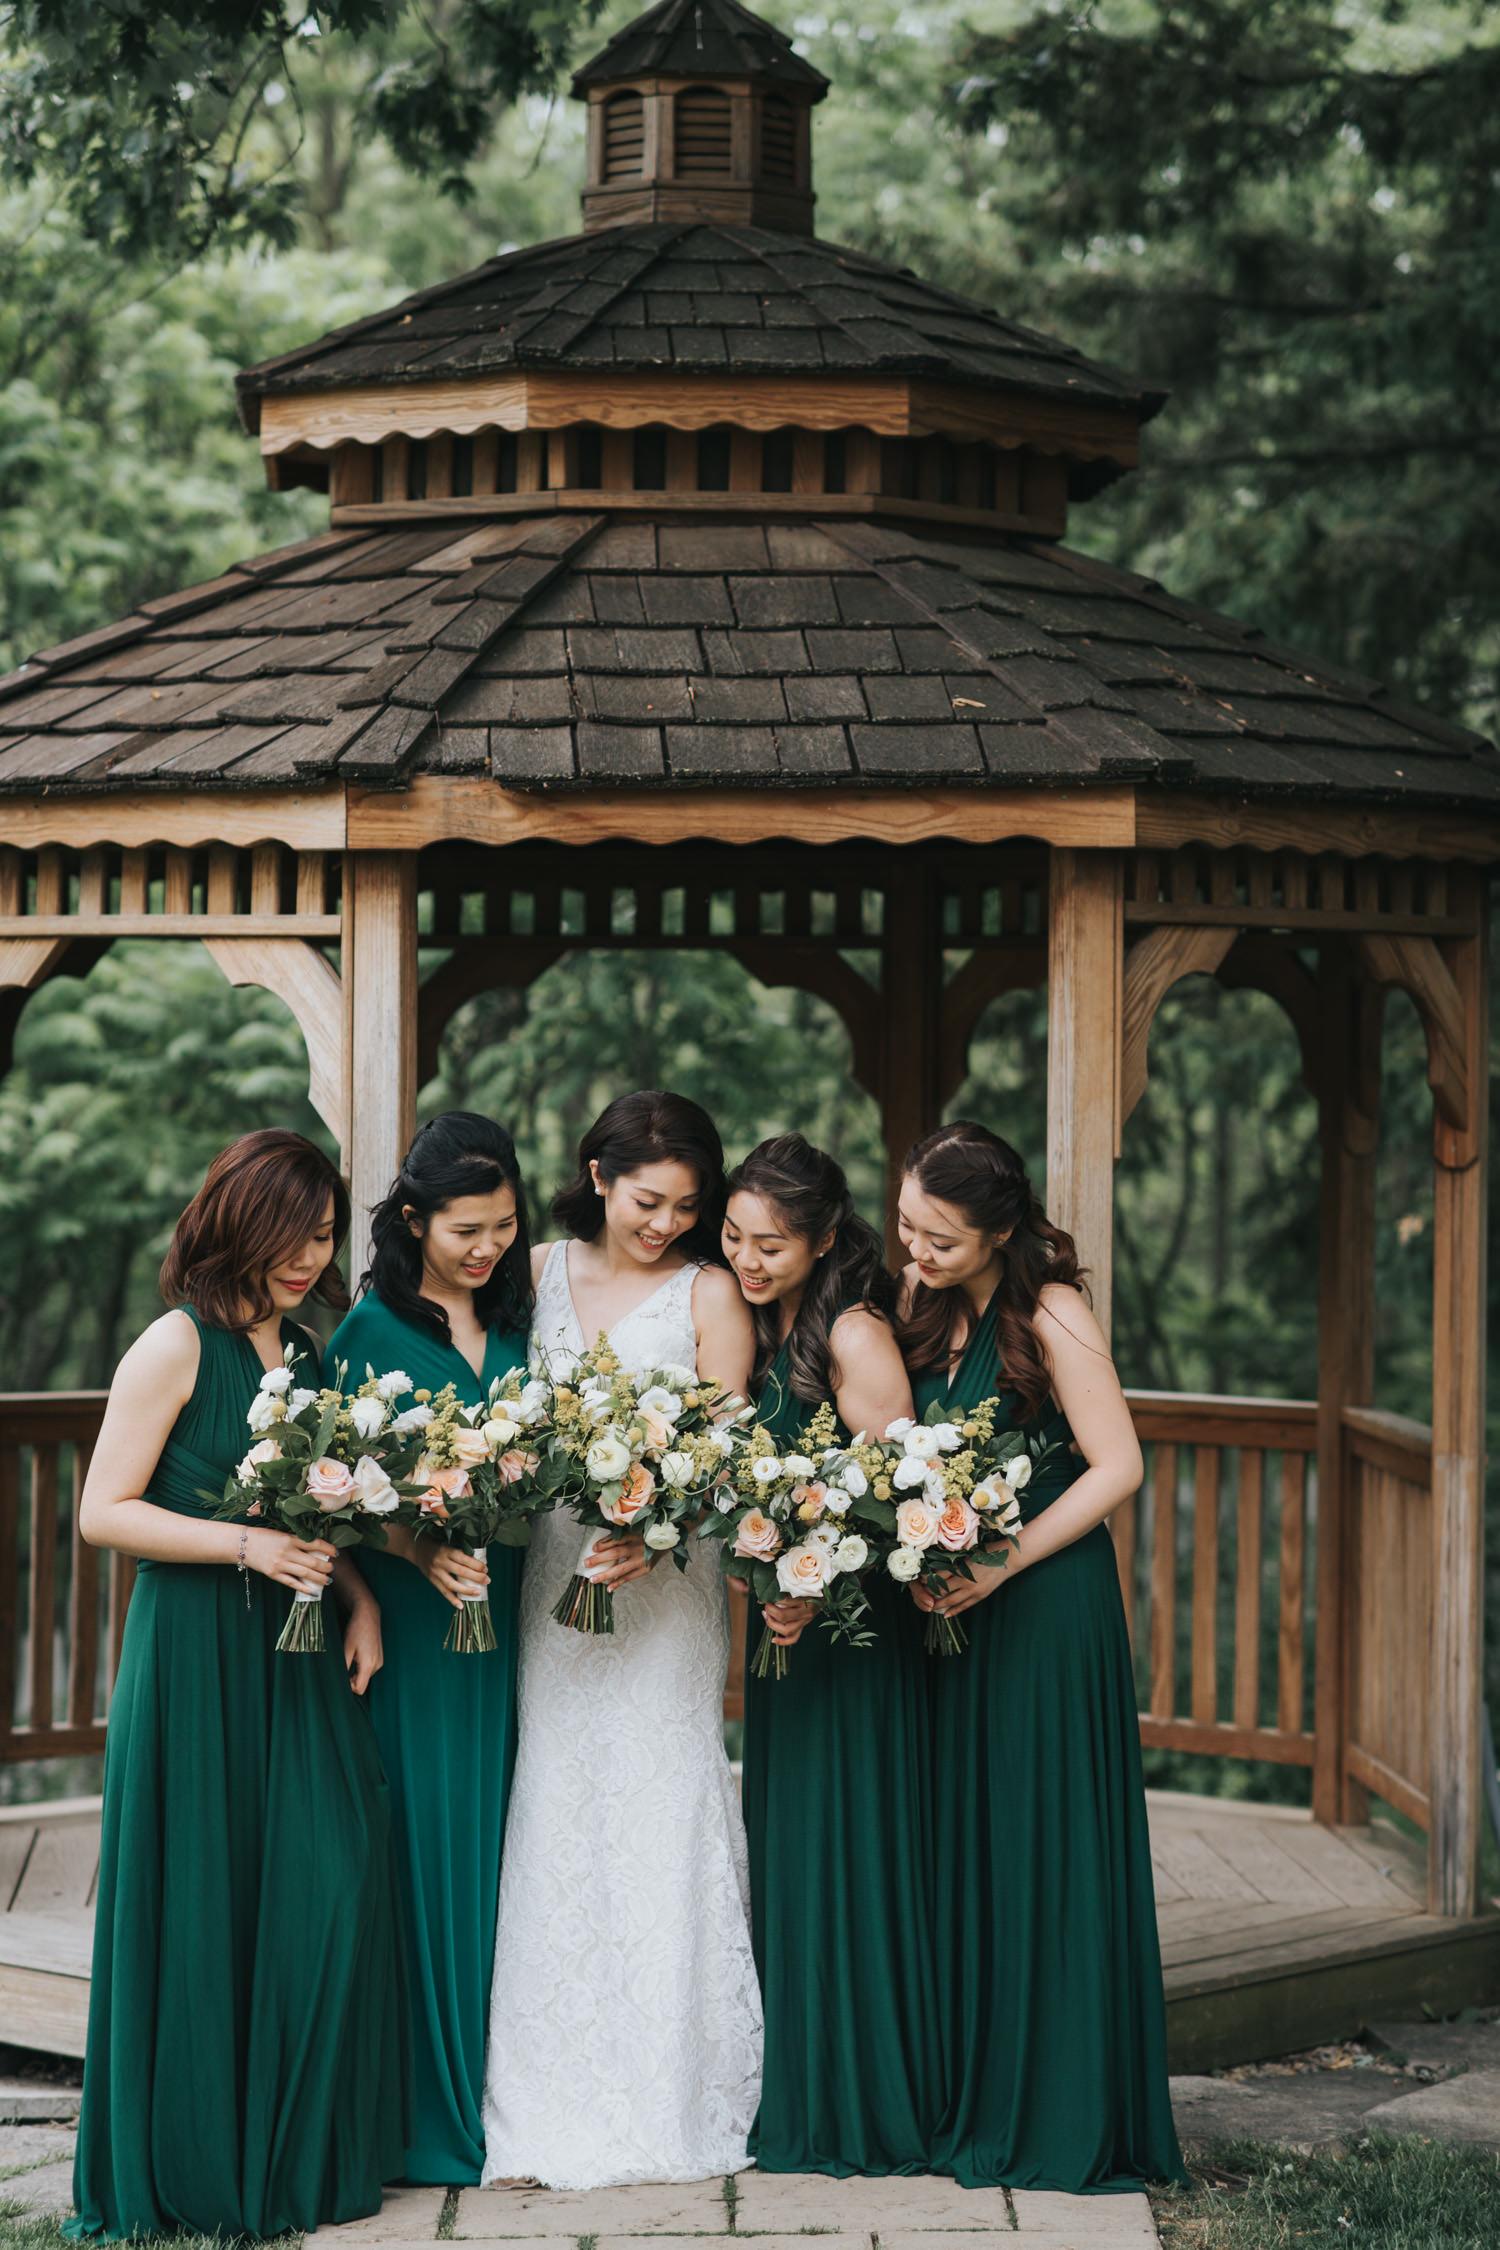 Doctor's House bride and bridesmaids at wooden gazebo photos